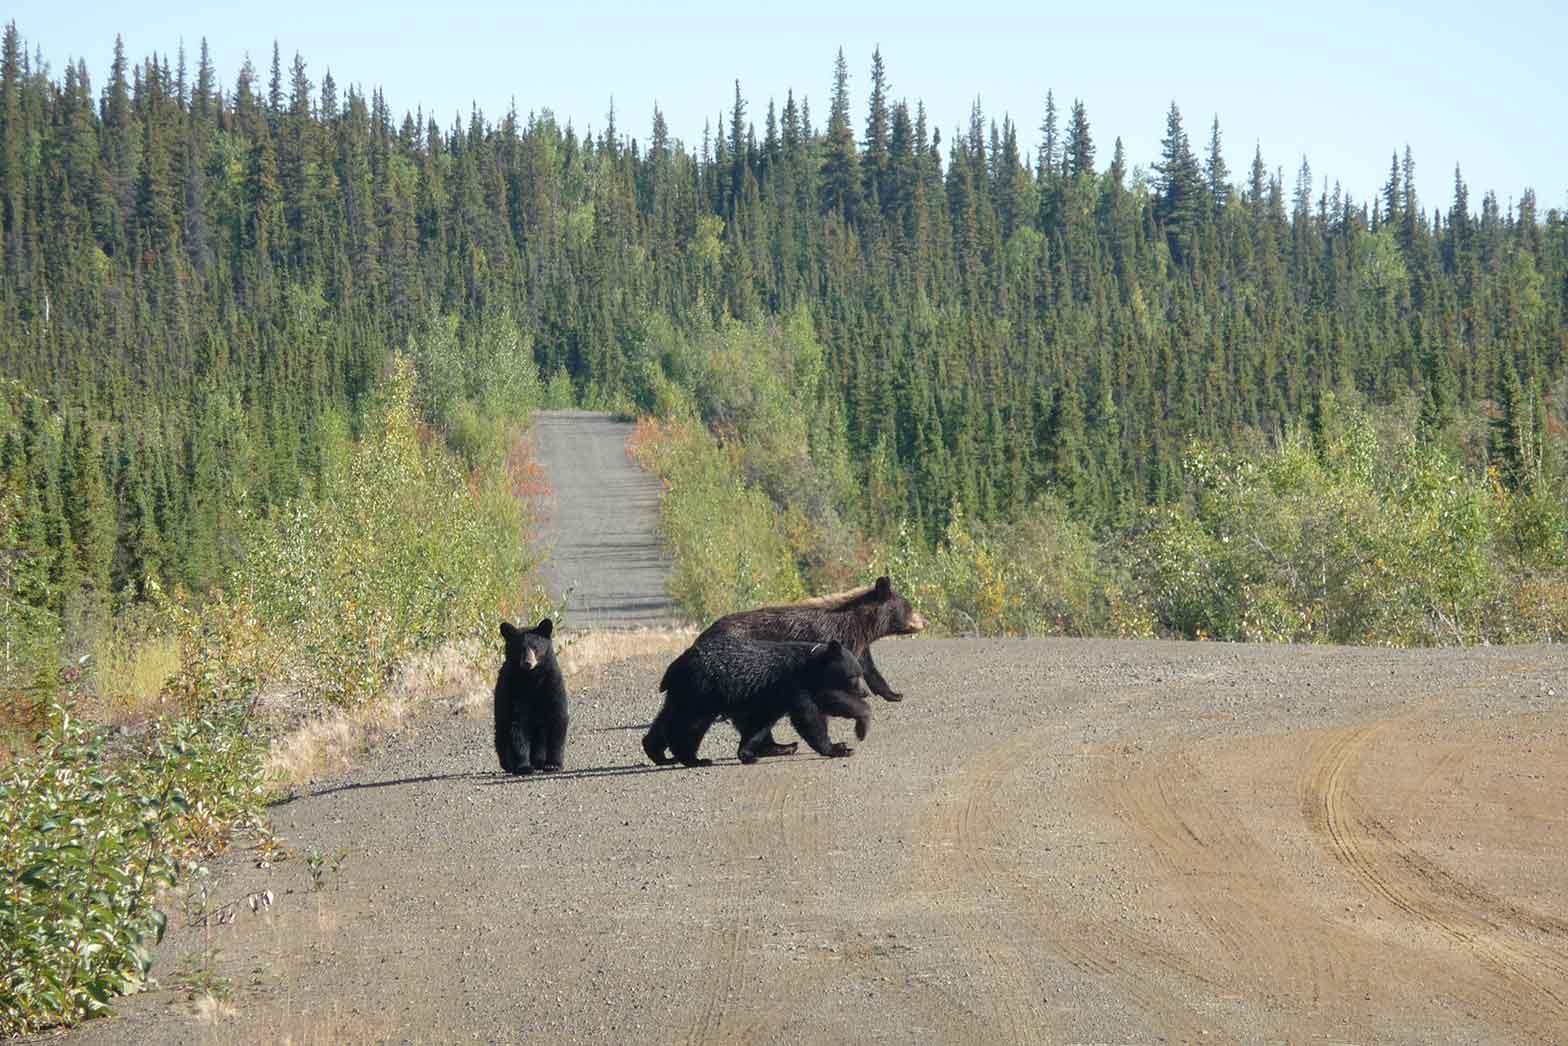 The Three Bears - Dalton Highway